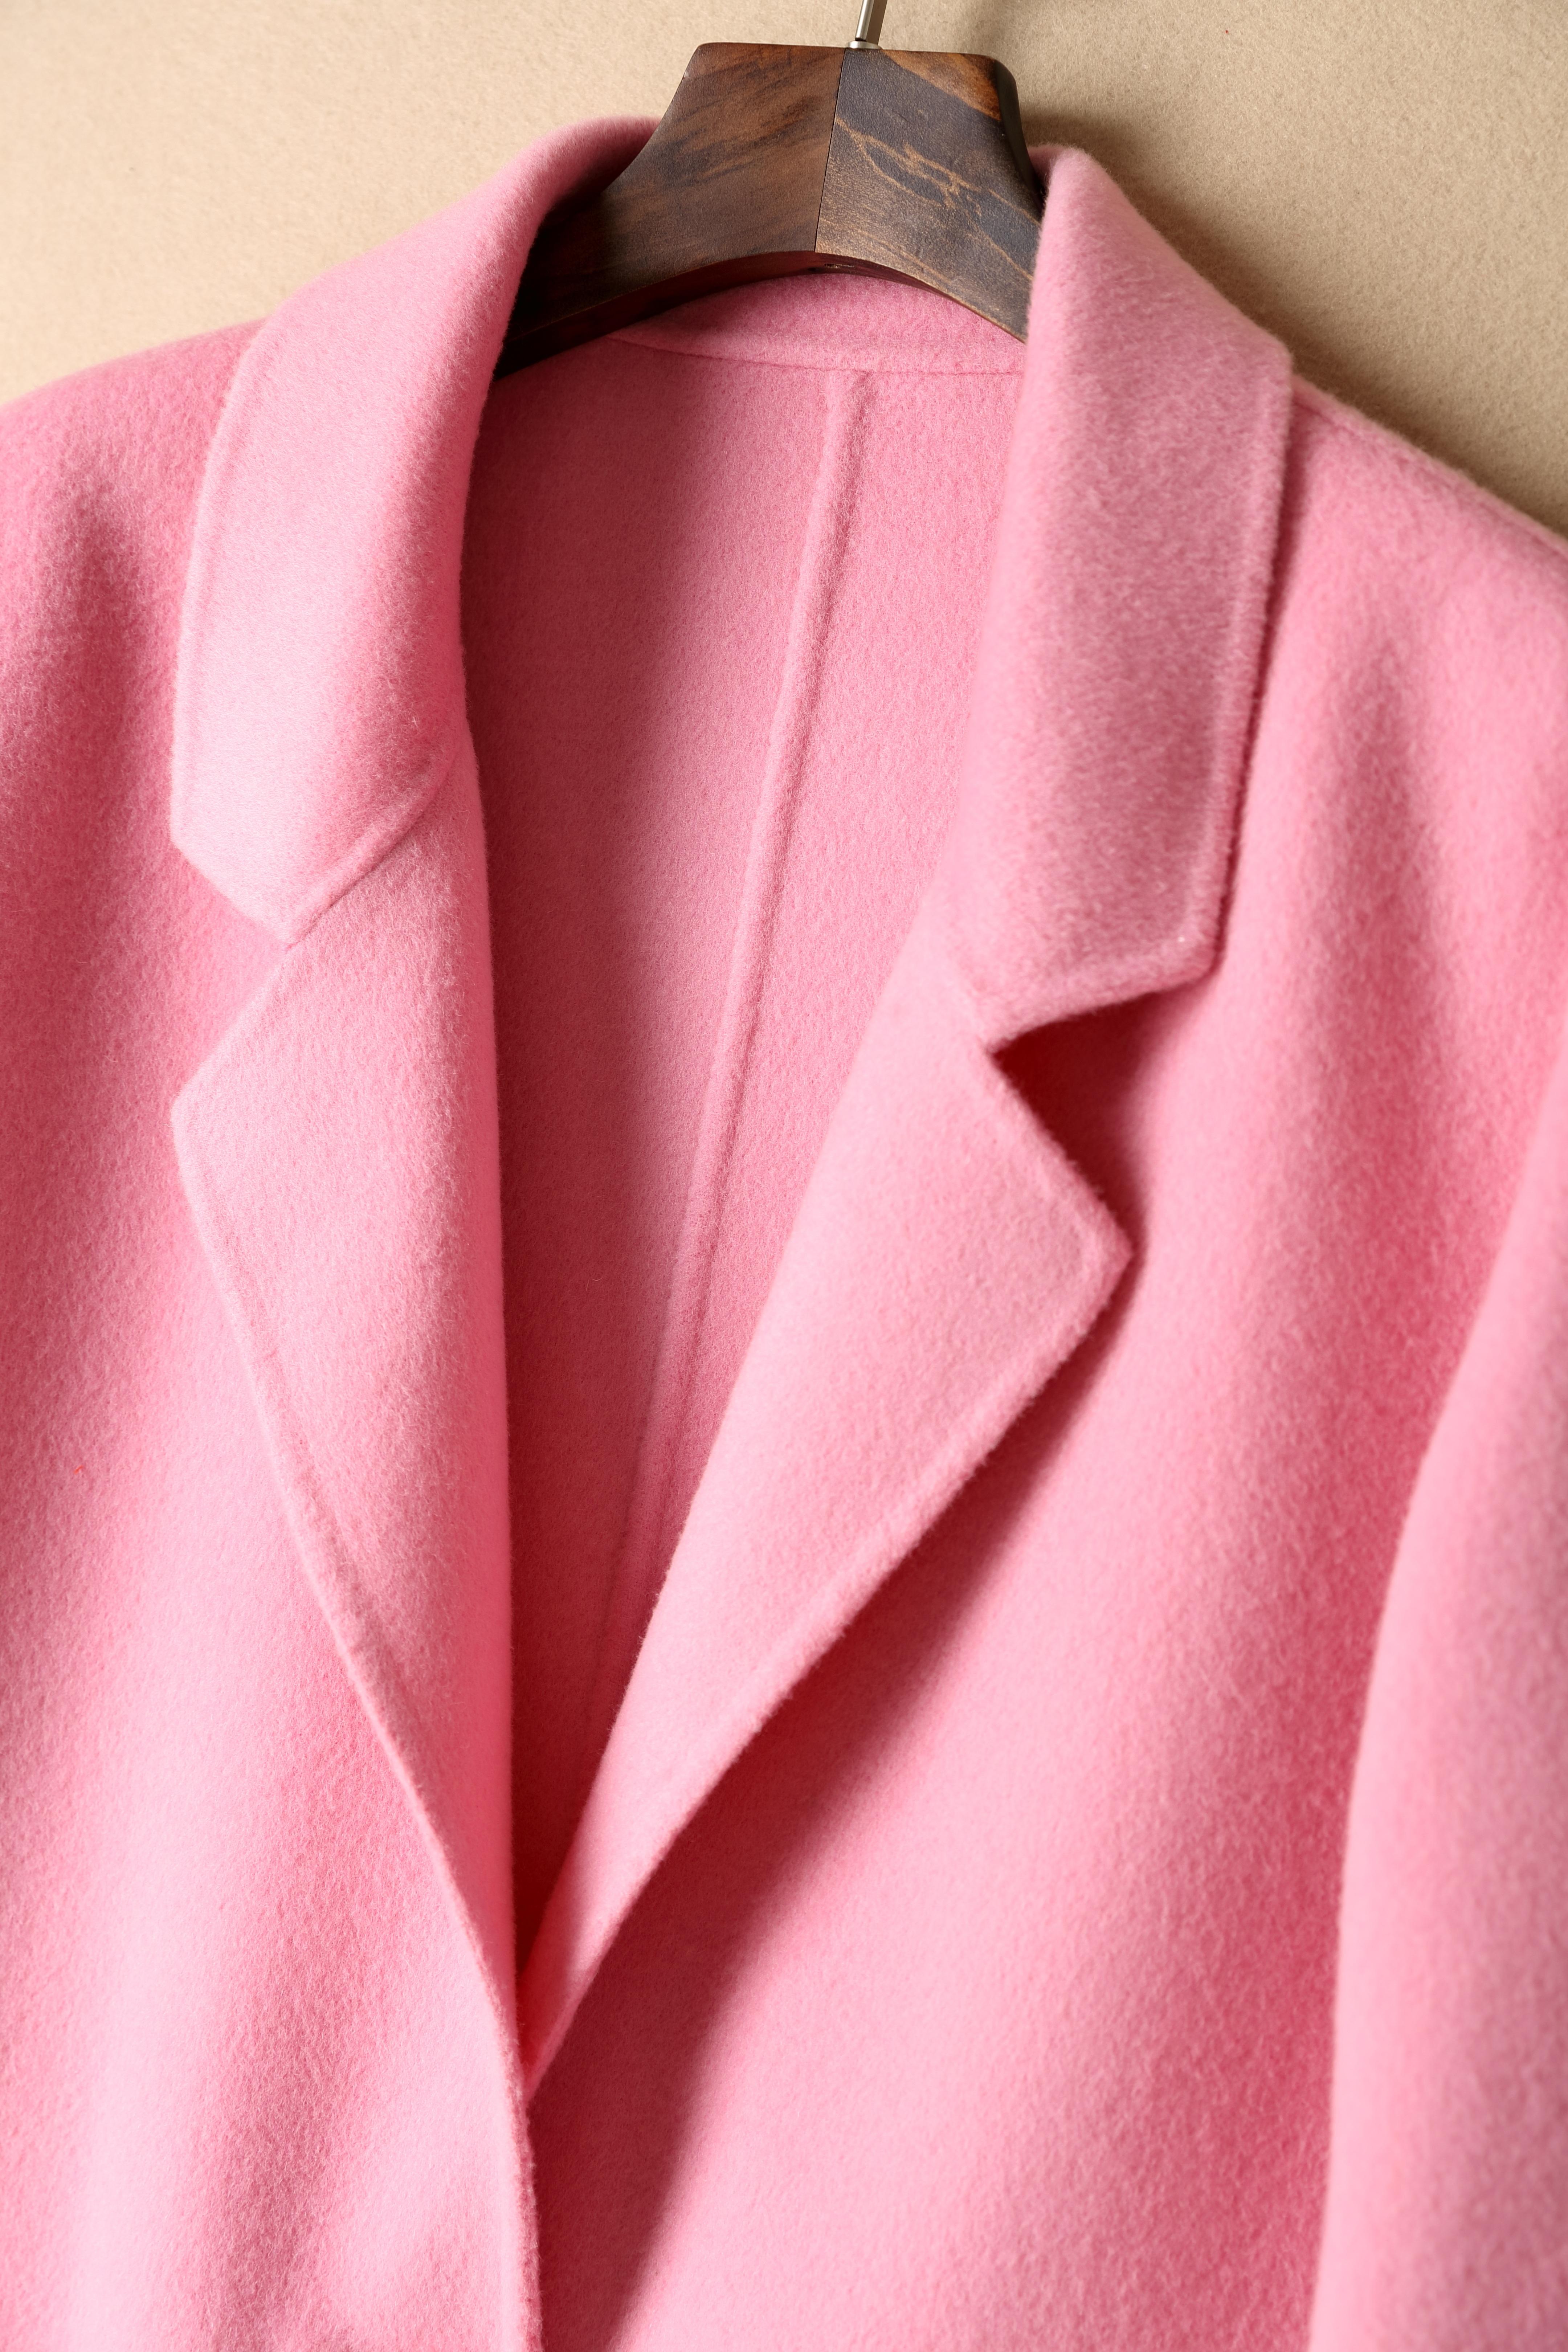 Gambar Pola Mantel Mode Berwarna Merah Muda Pakaian Luar